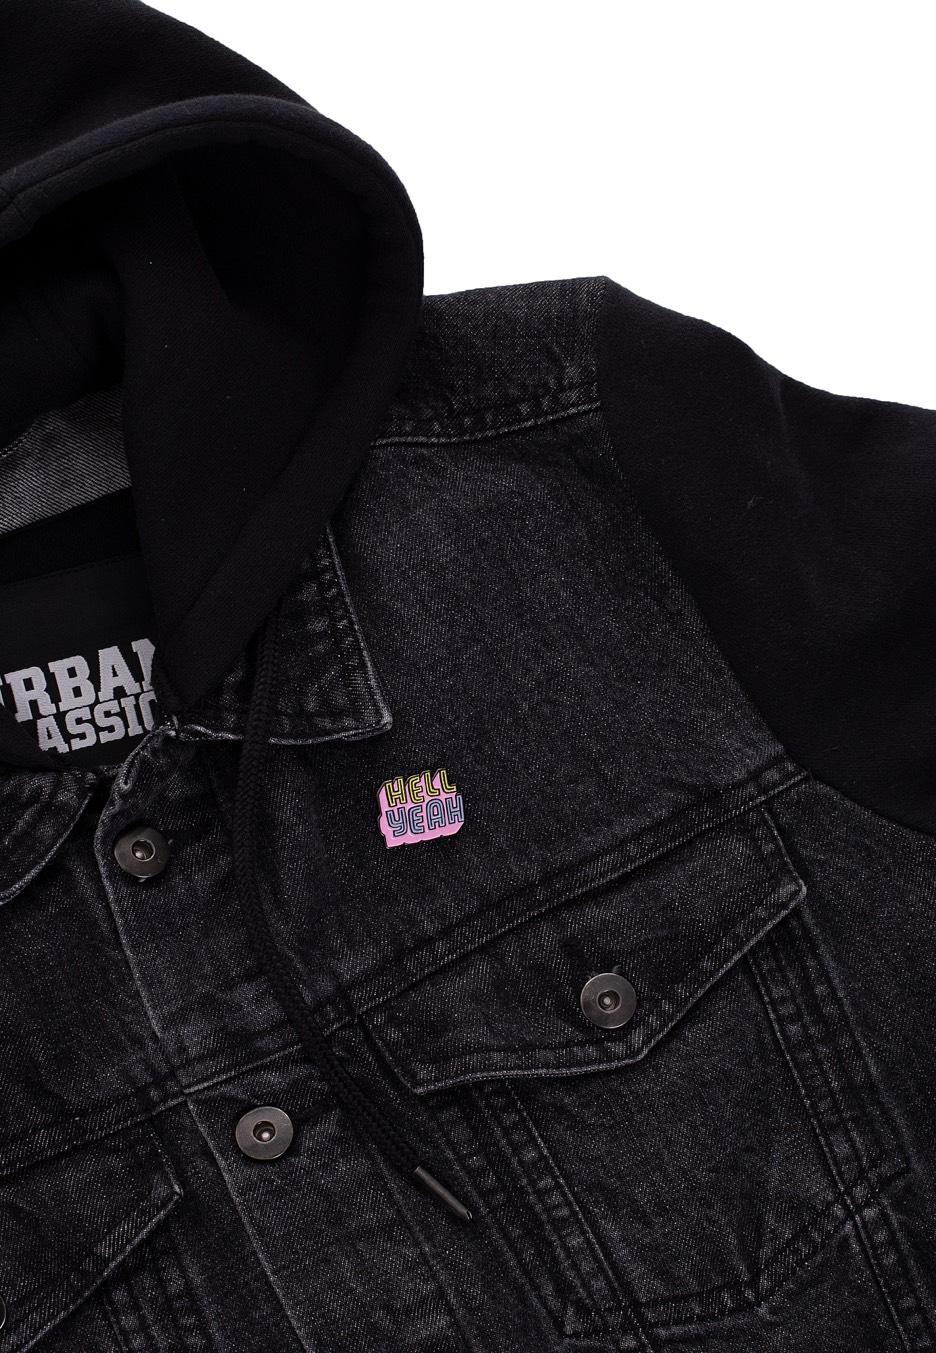 Punky Pins - Hell Yeah Soft Enamel - Pin - Streetwear Shop ... 57c5f9dfd8bb8